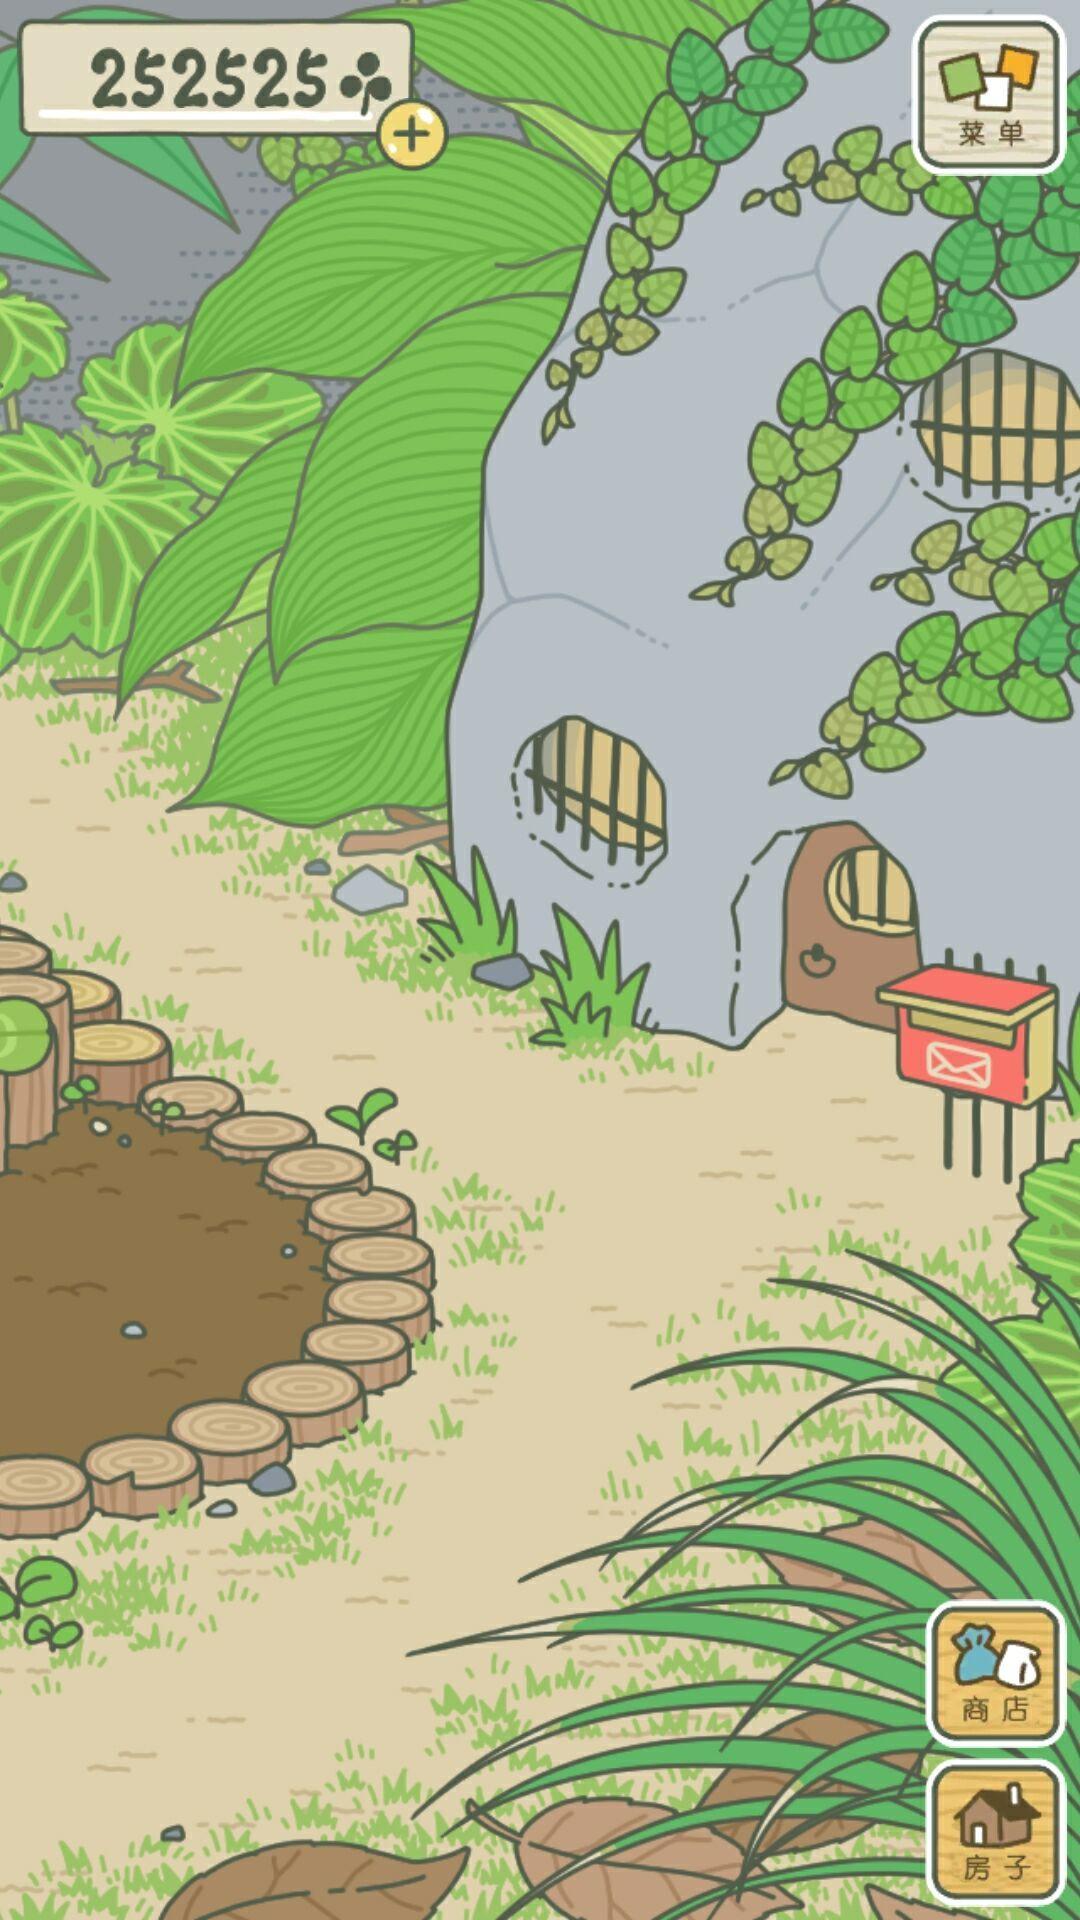 玩《旅行青蛙(旅かえる)》有哪些体验?逃脱秀1001攻略3密室图片